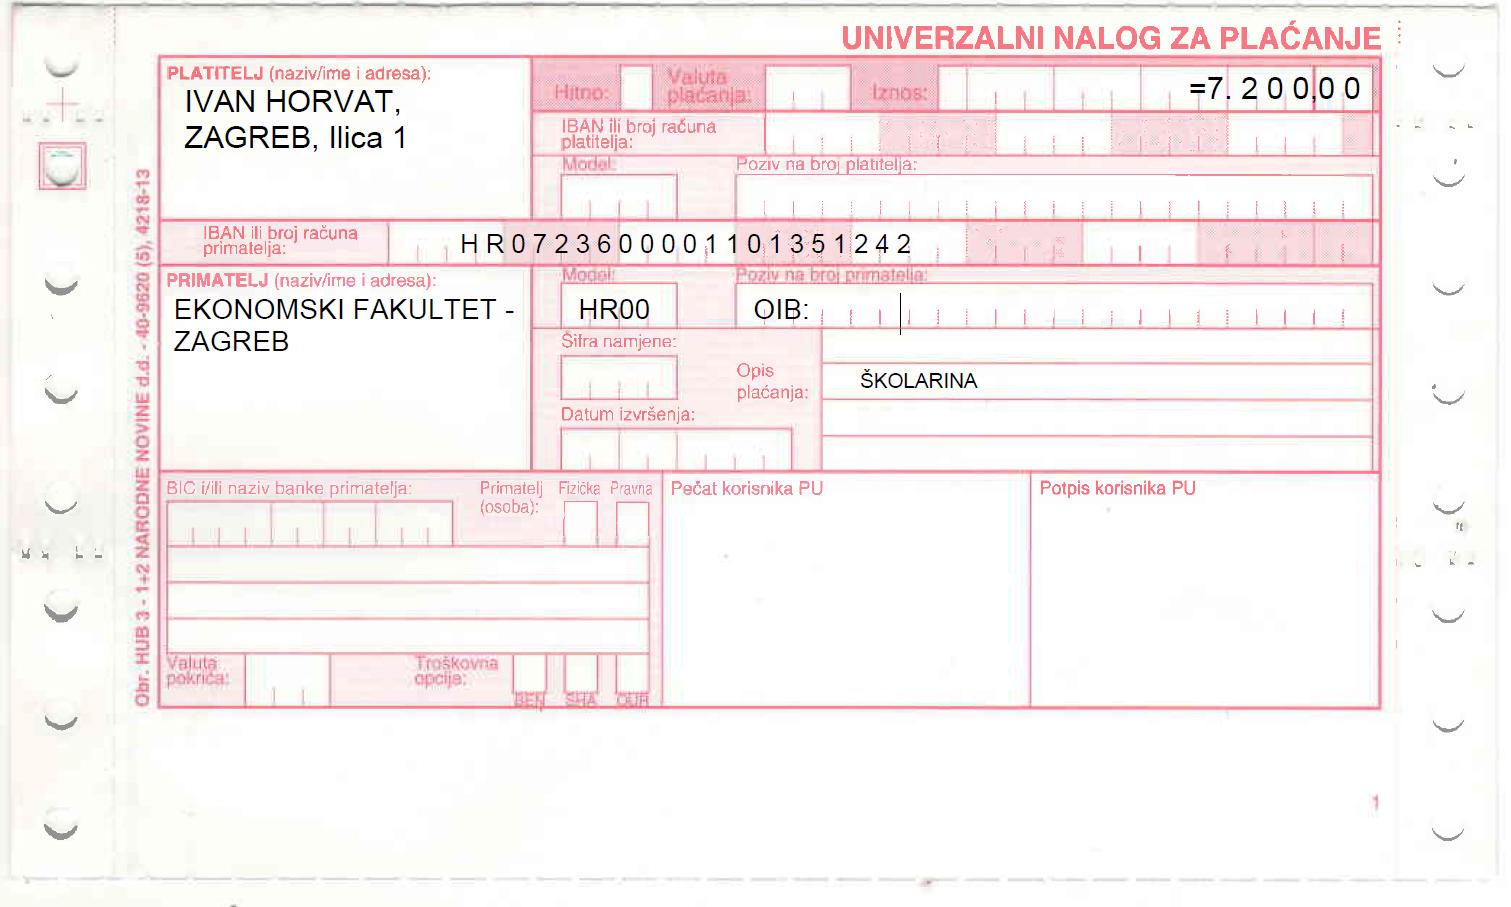 Upis Studenata U Vise Godine Studija Efzg Ekonomski Fakultet Zagreb